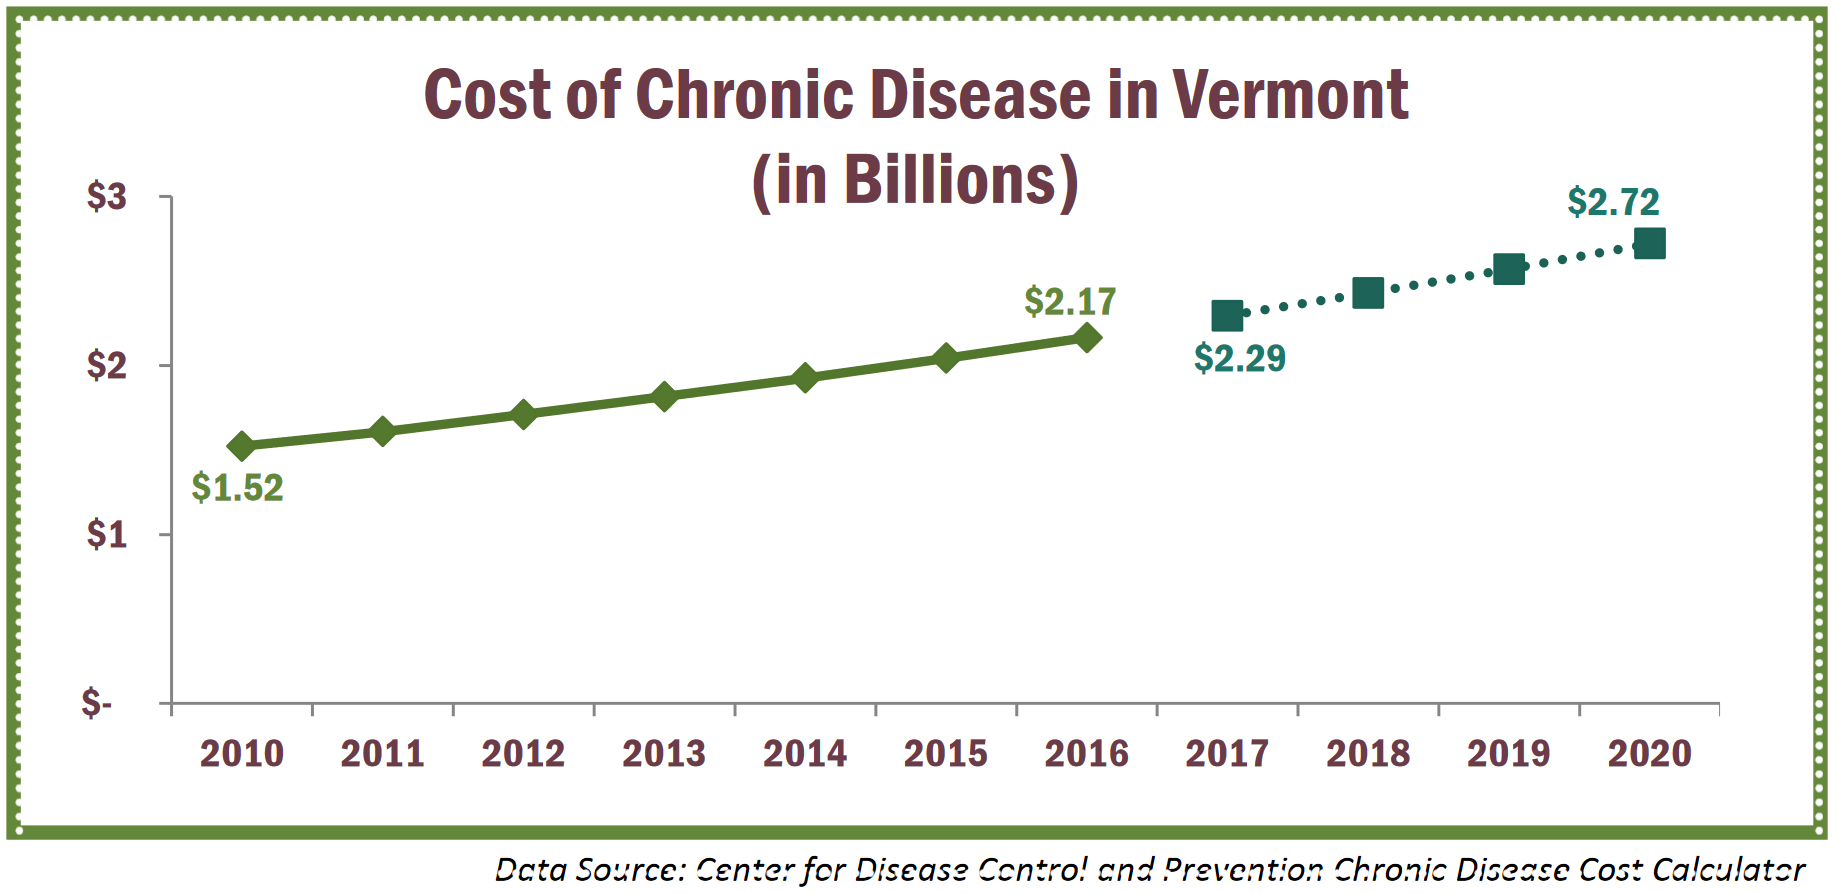 Source: VT Dept. of Health